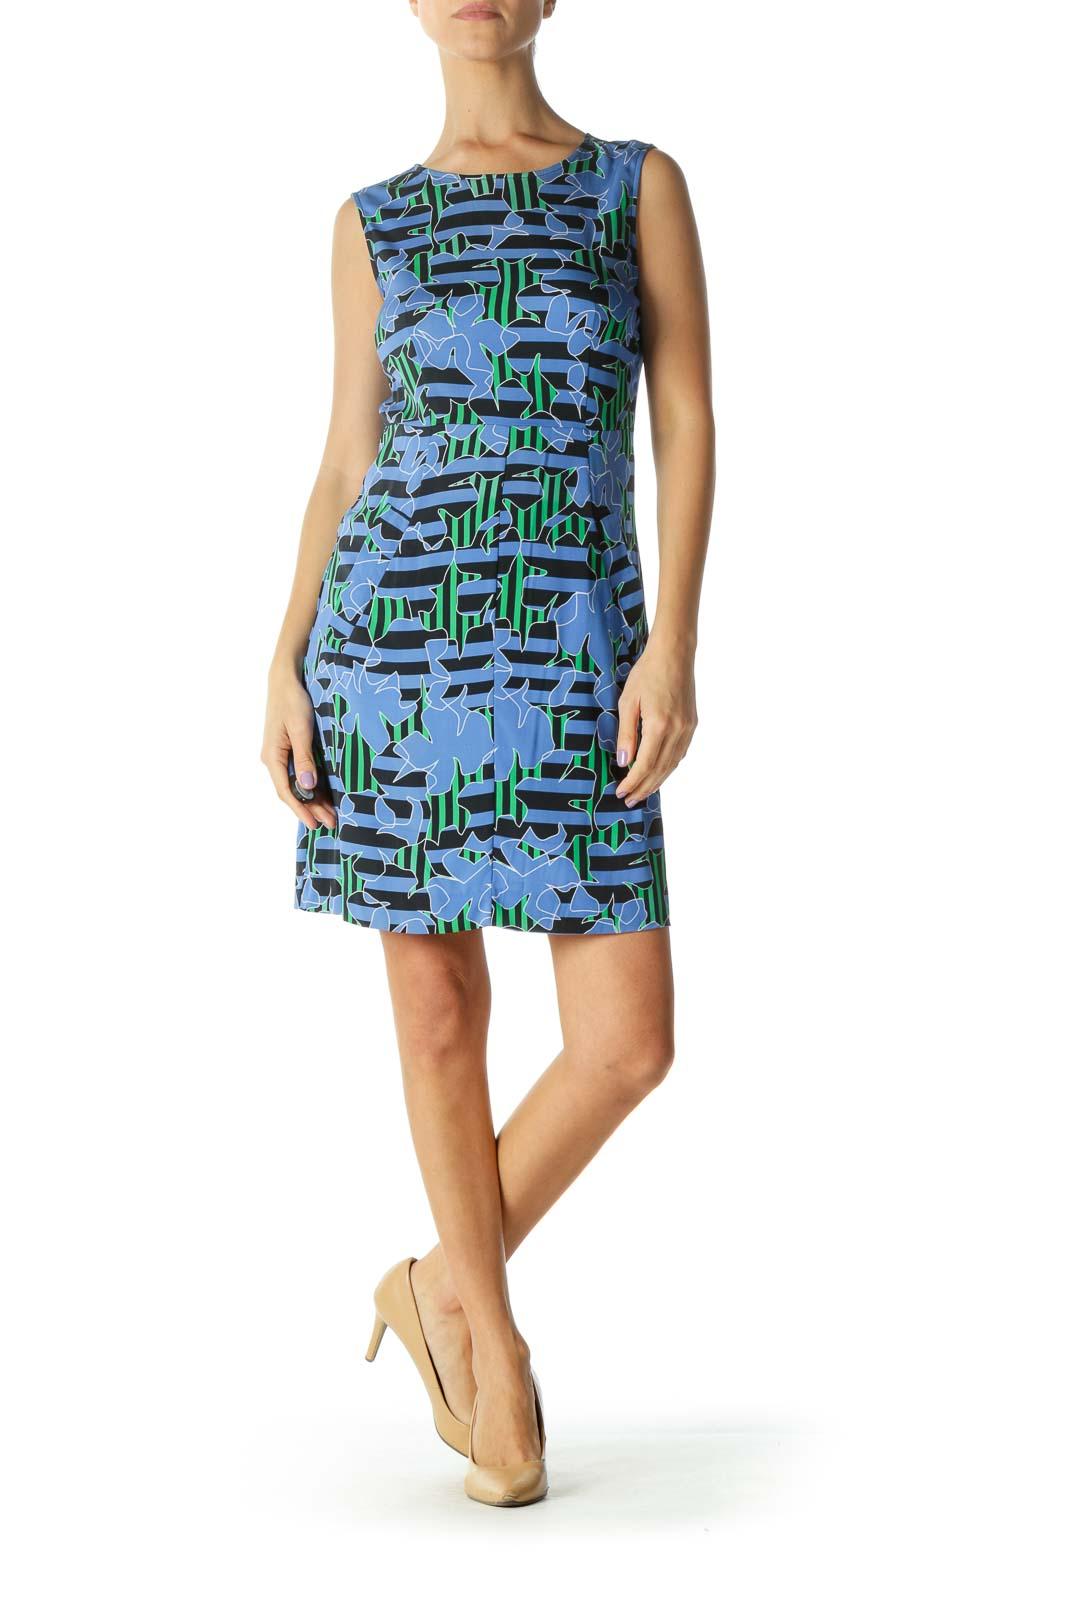 Black and Blue Striped Print Sheath Dress